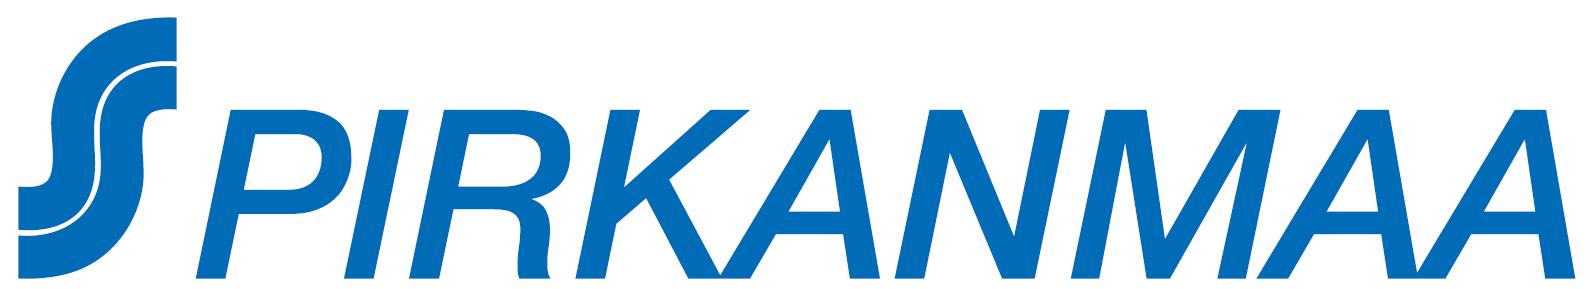 logo: Pirkanmaan Osuuskauppa